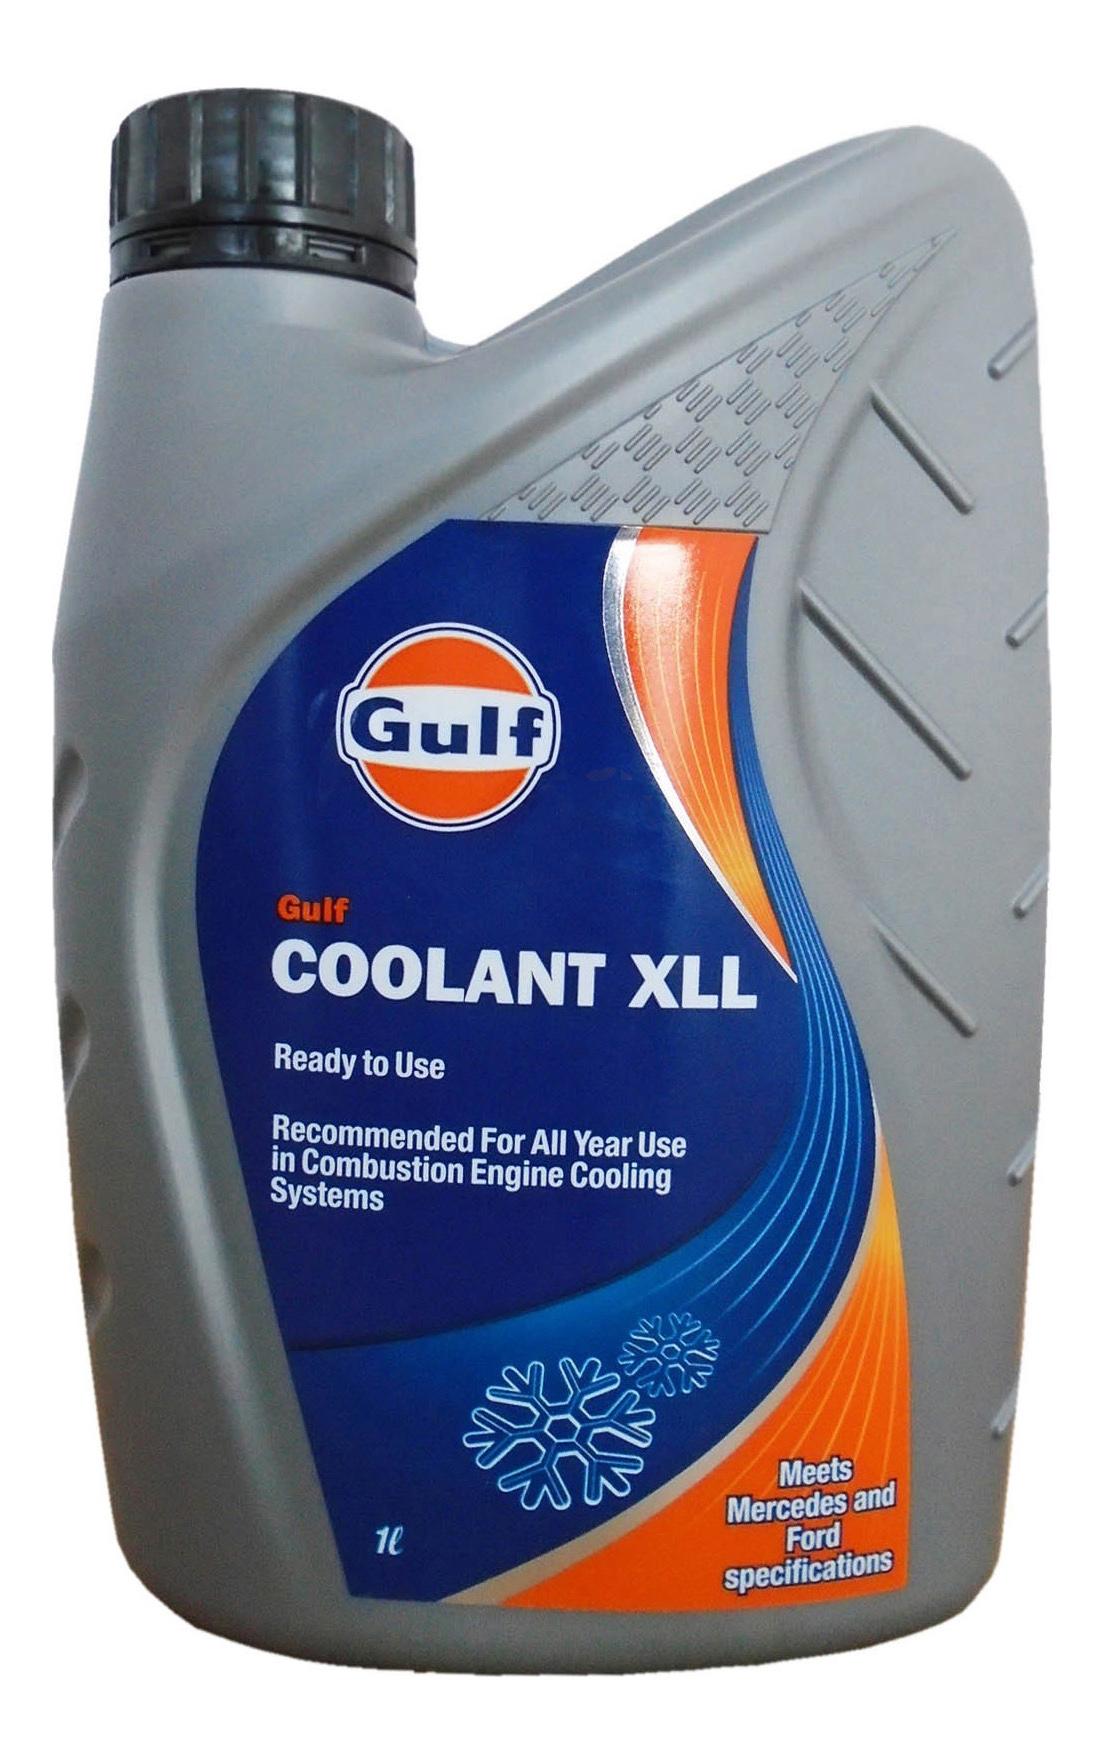 Антифриз GULF GULF COOLANT XLL G12+ синий готовый антифриз 1л фото